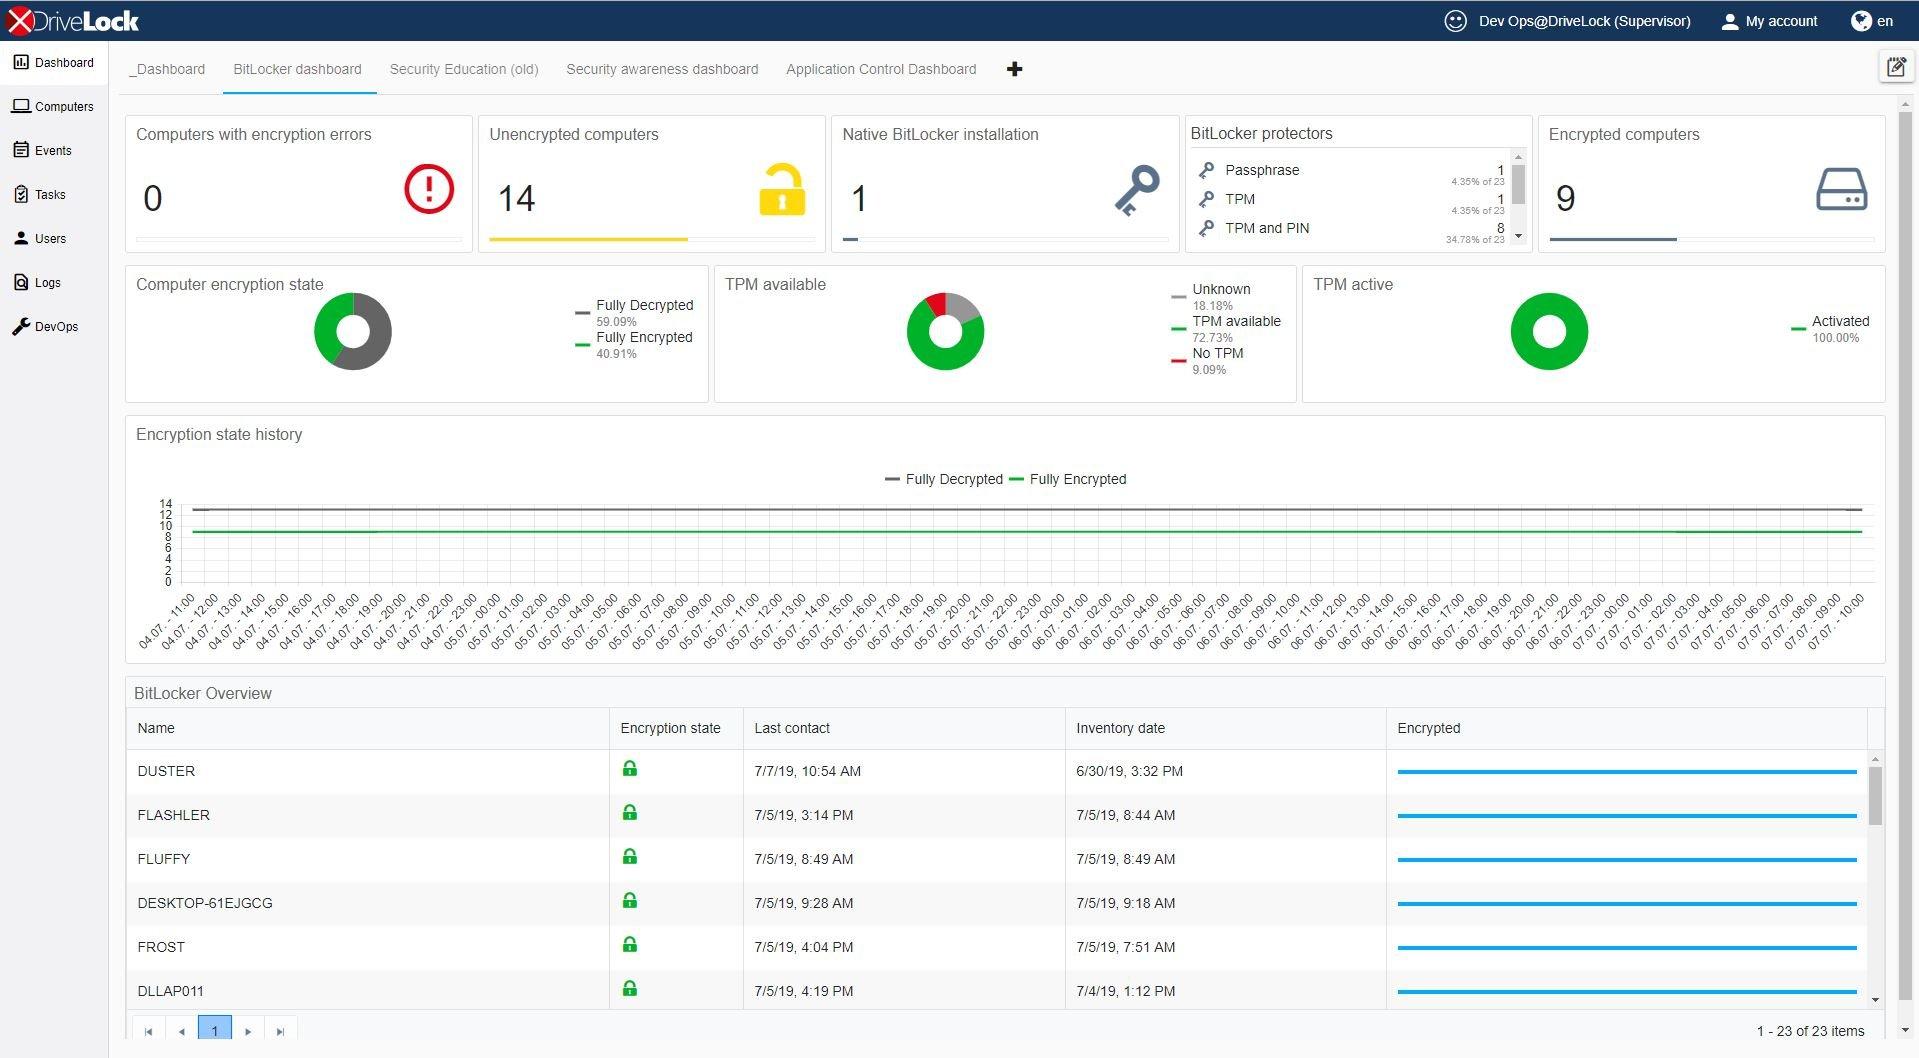 DriveLock Dashboard - Central Management of Windows Bitlocker disk encryption, e.g. bitlocker windows 10